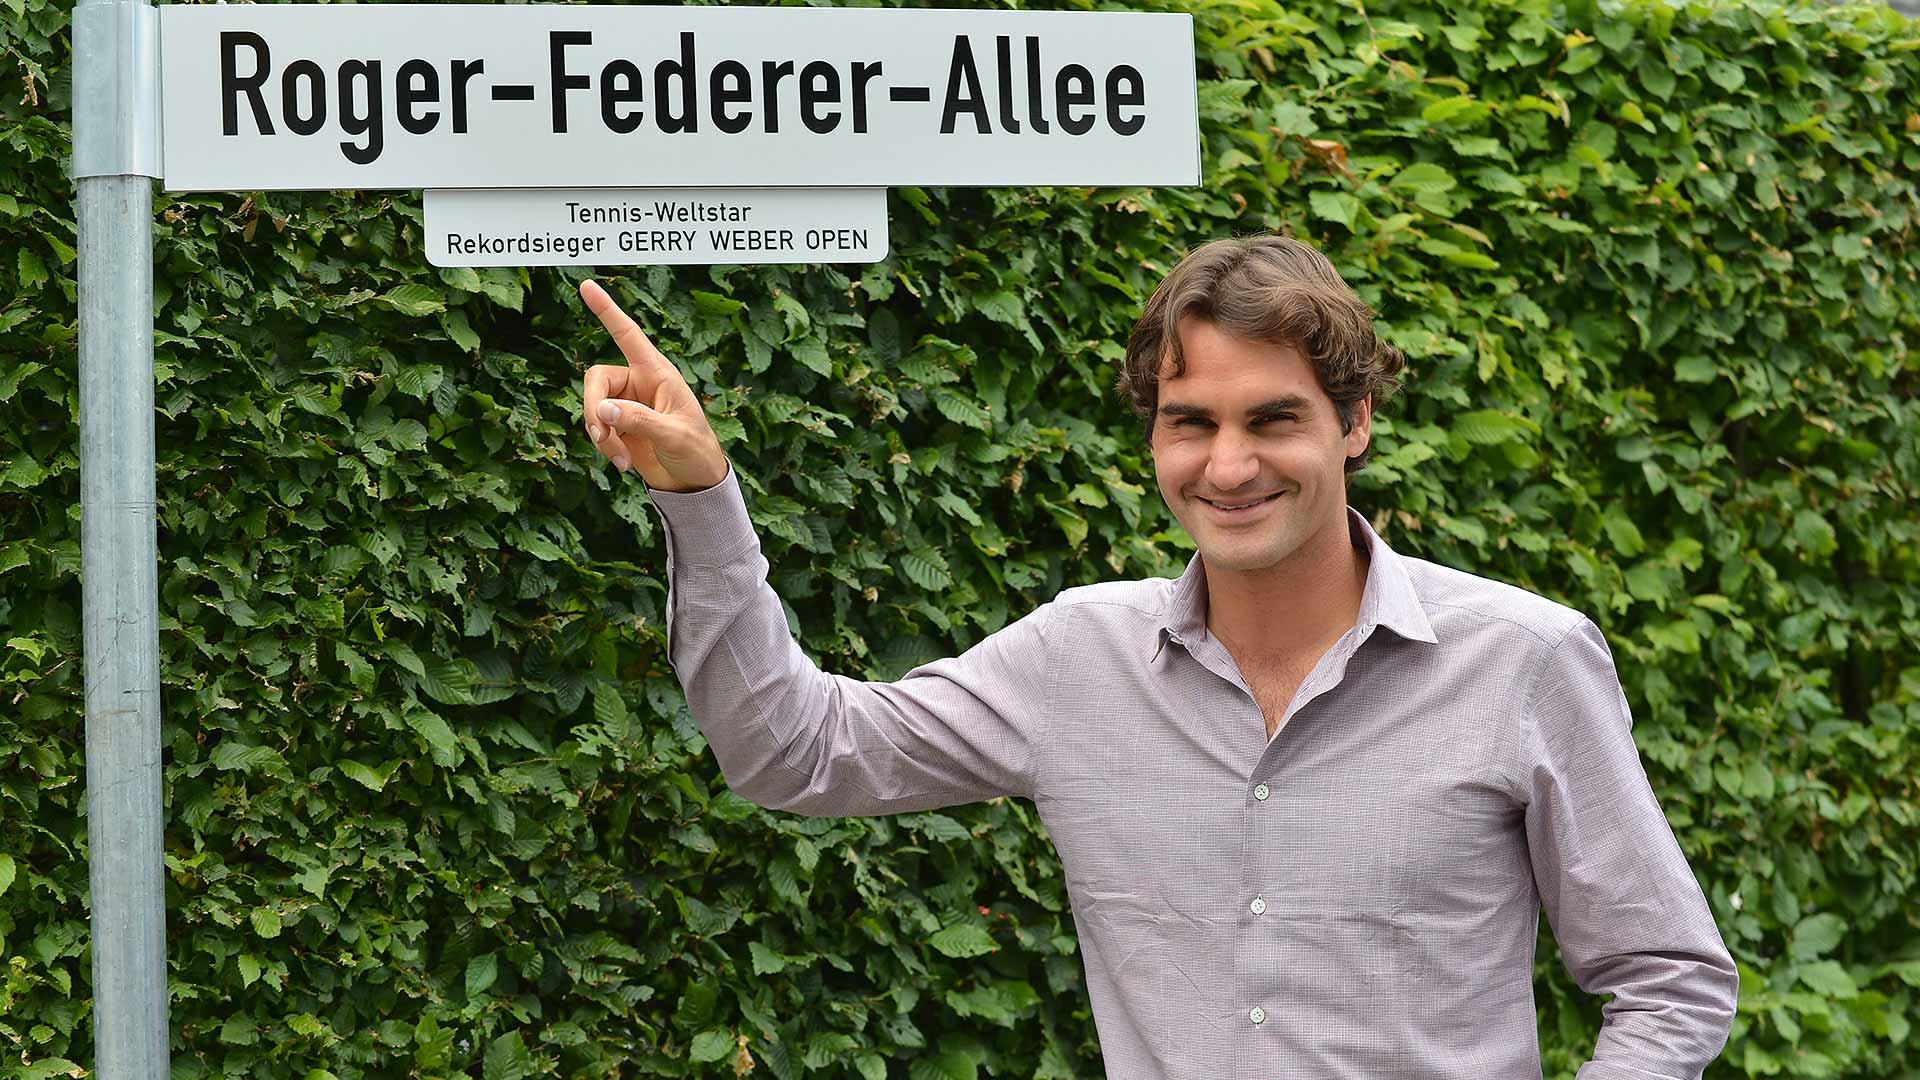 Federer Halle Street